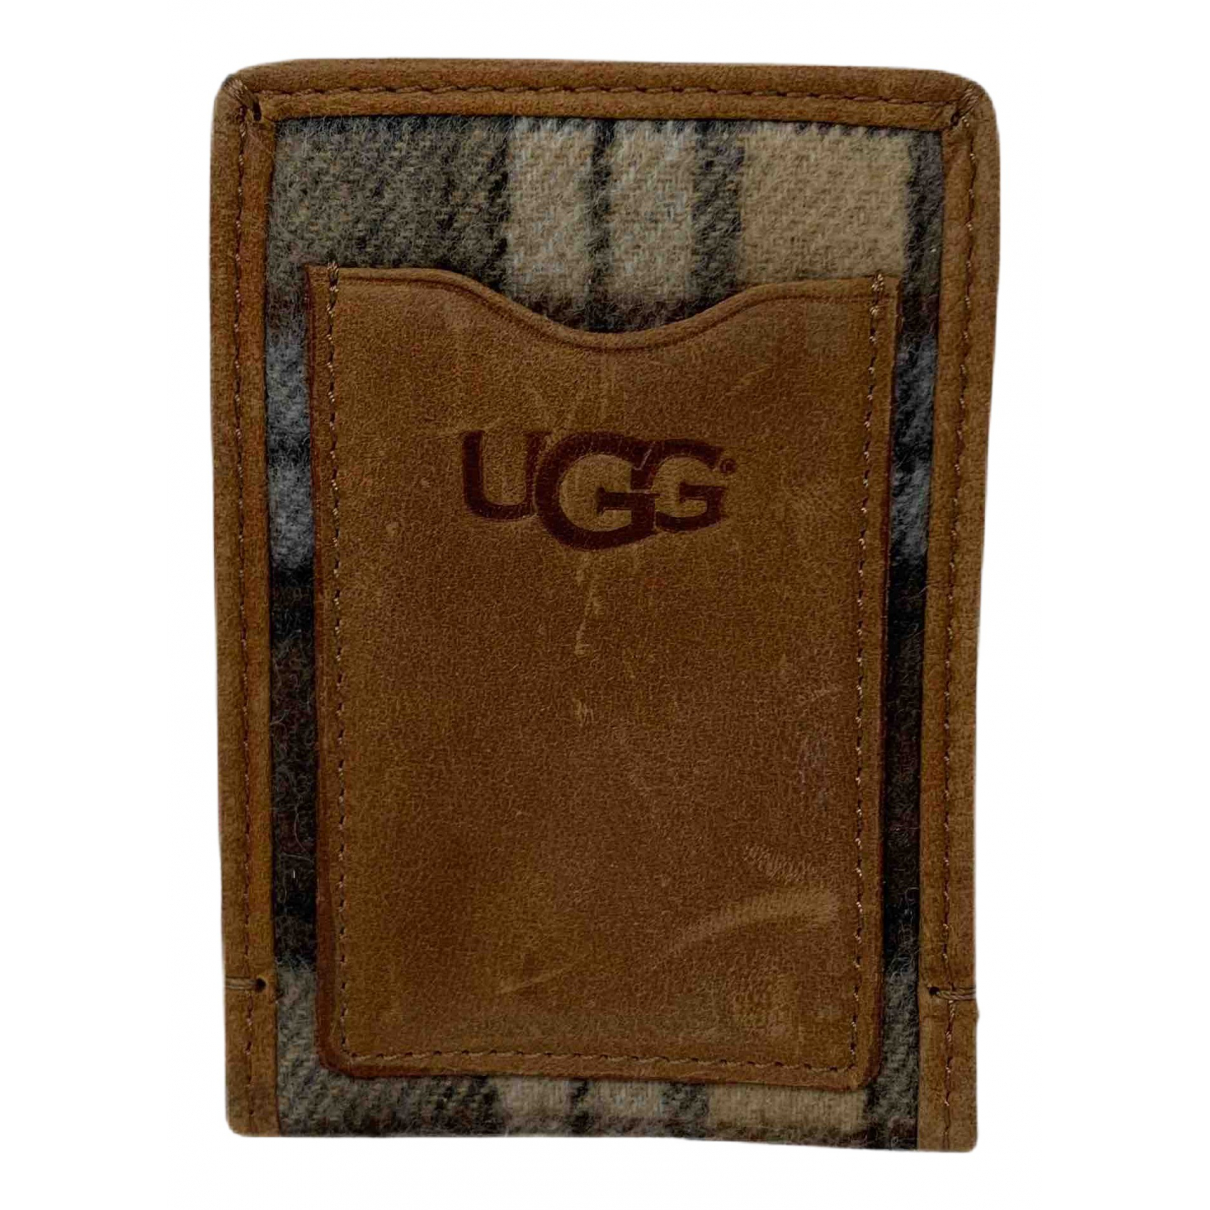 Ugg \N Portemonnaie in  Braun Wolle